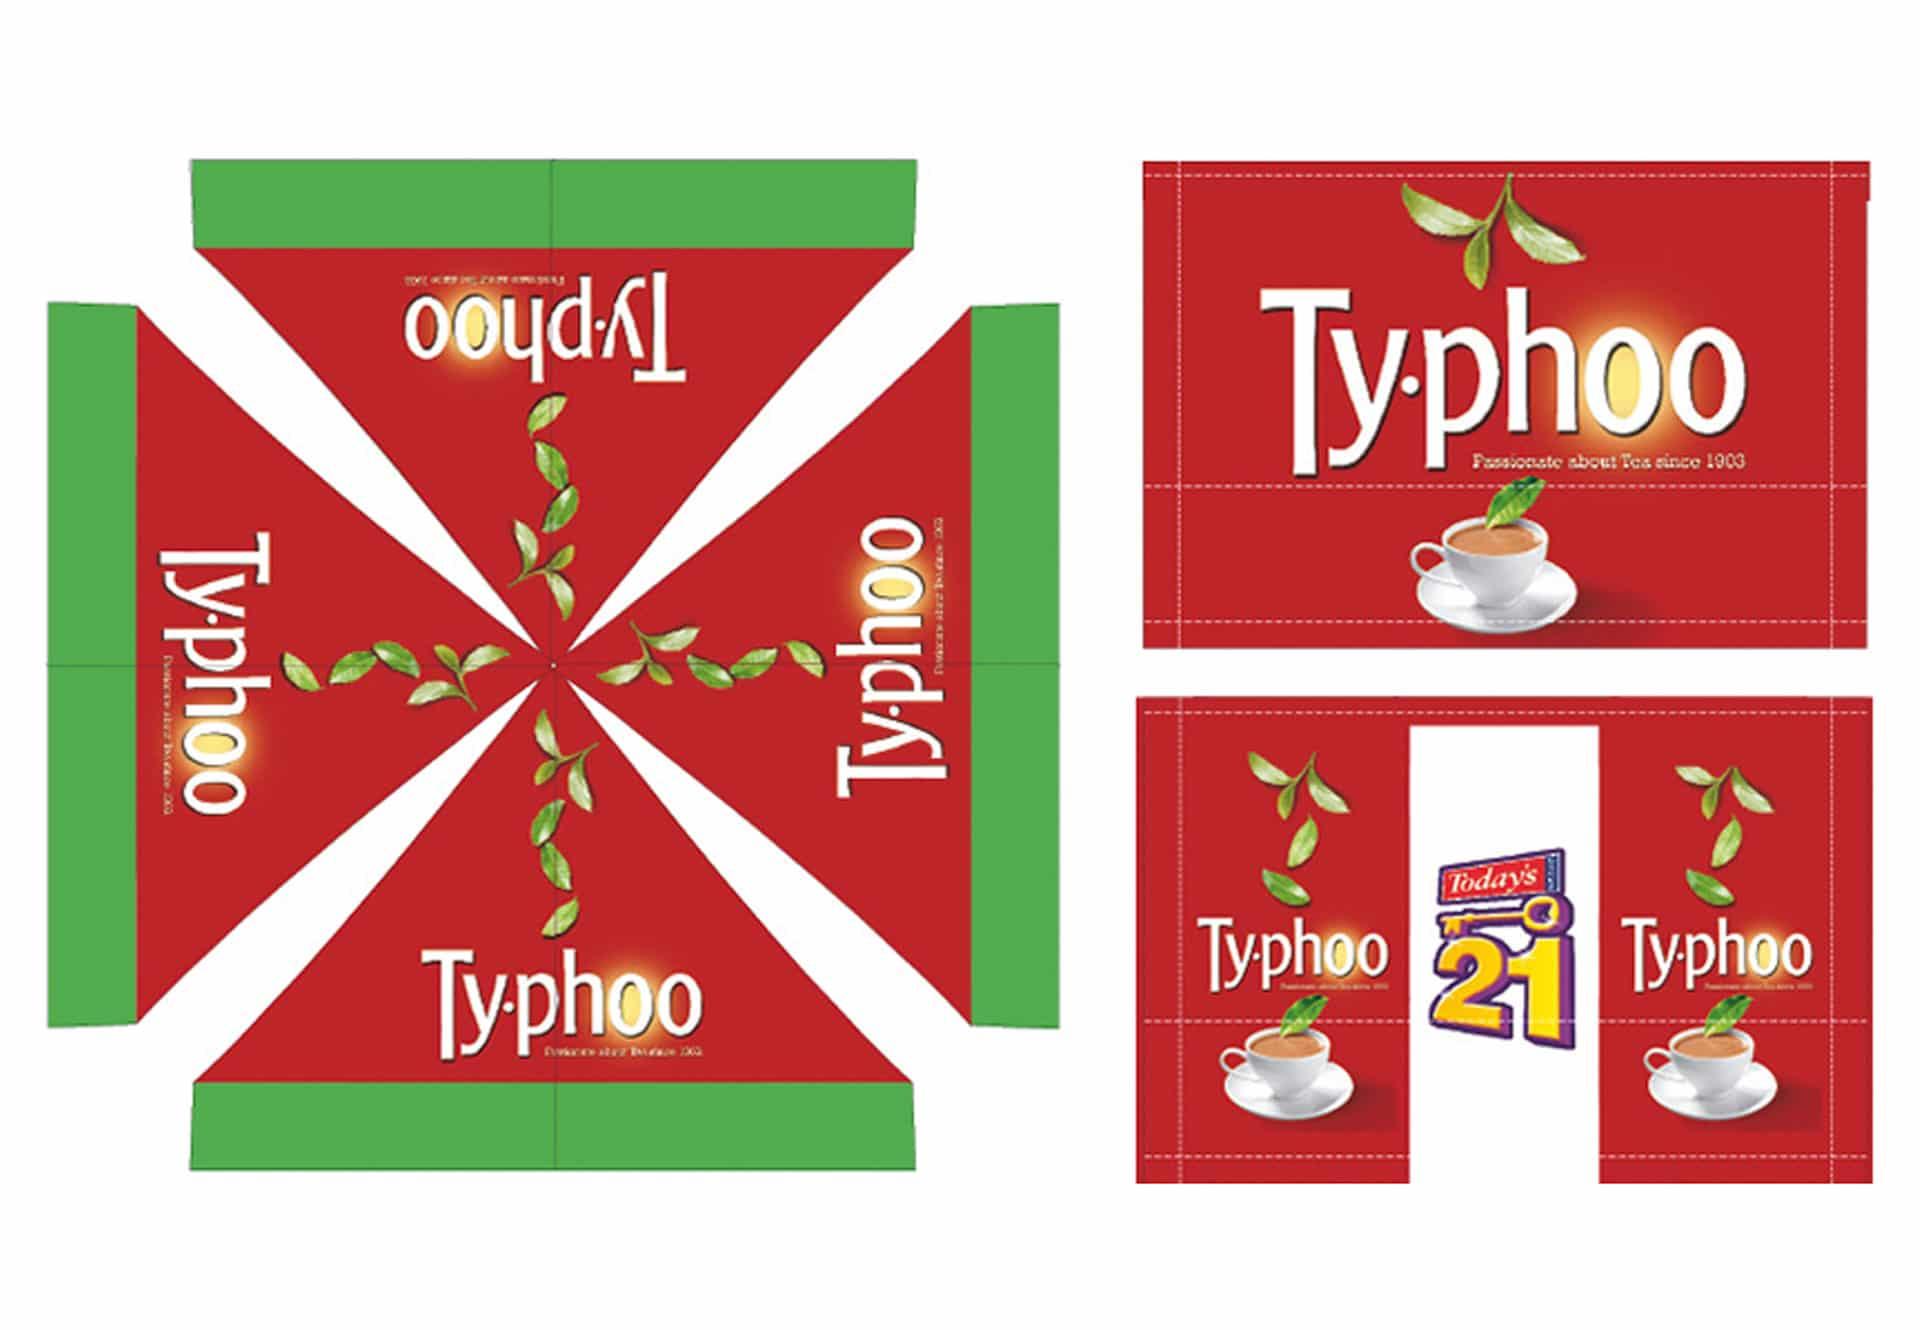 Qualytent Branding Dächer Wände - ty-phoo - 01